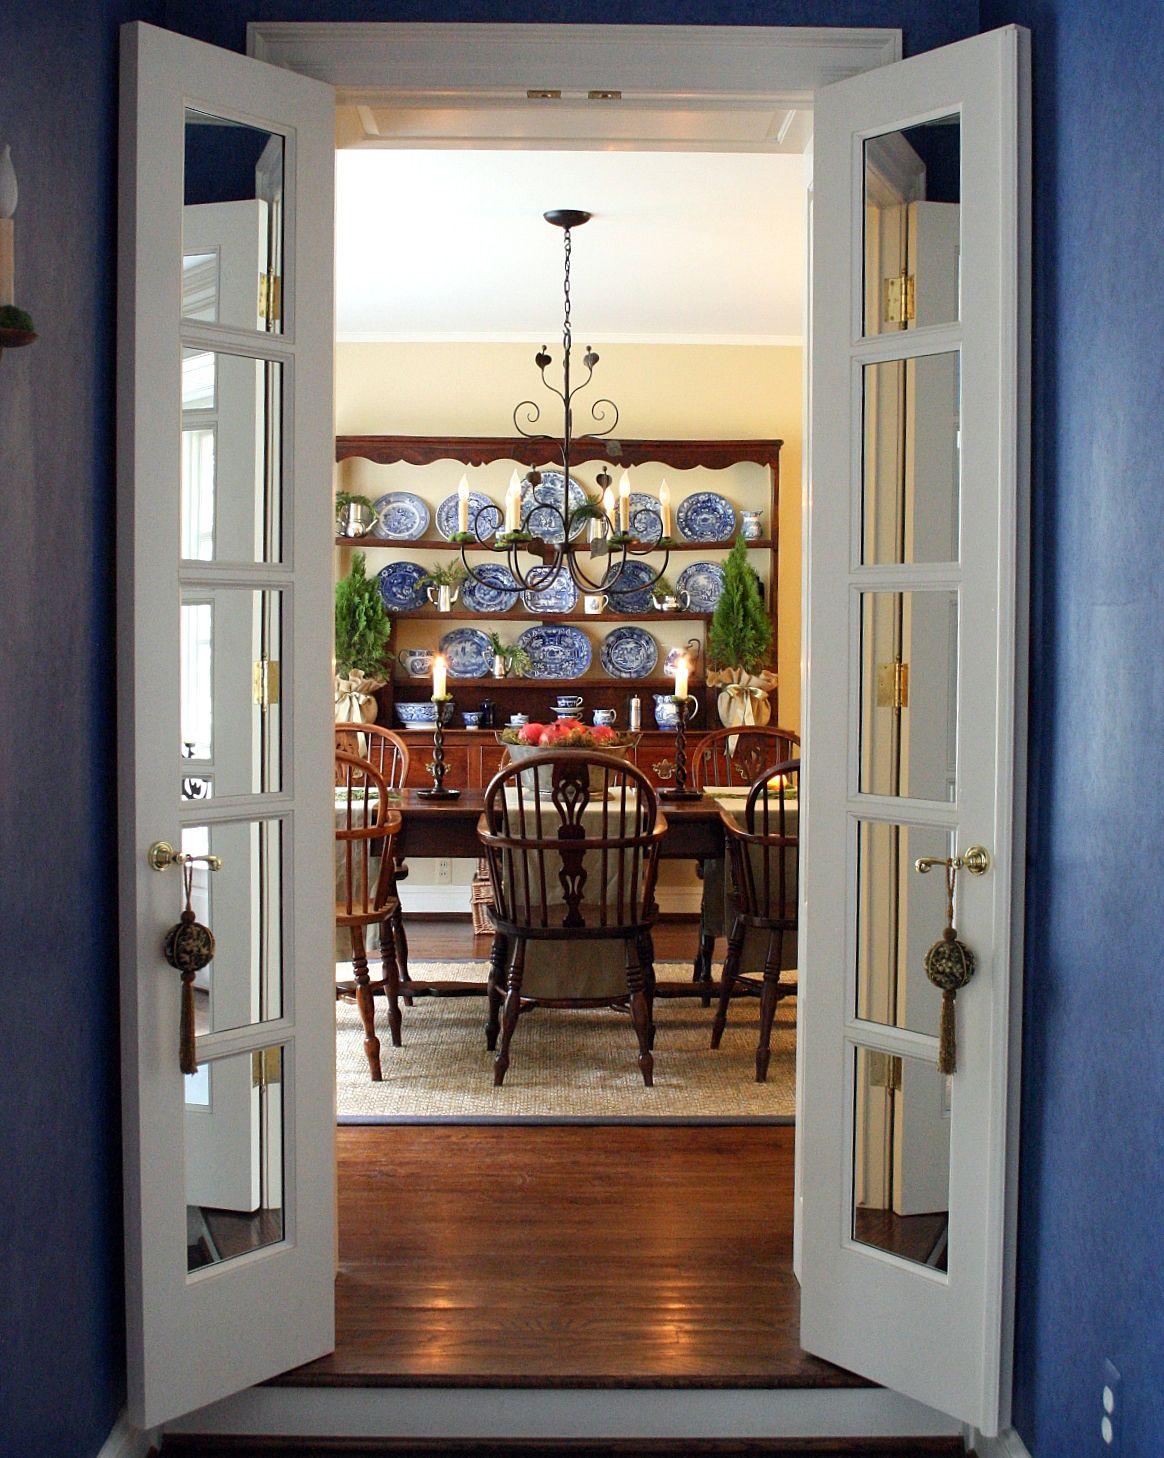 Mirrored French Doors mirrored french doors} for closet doors | { child's room